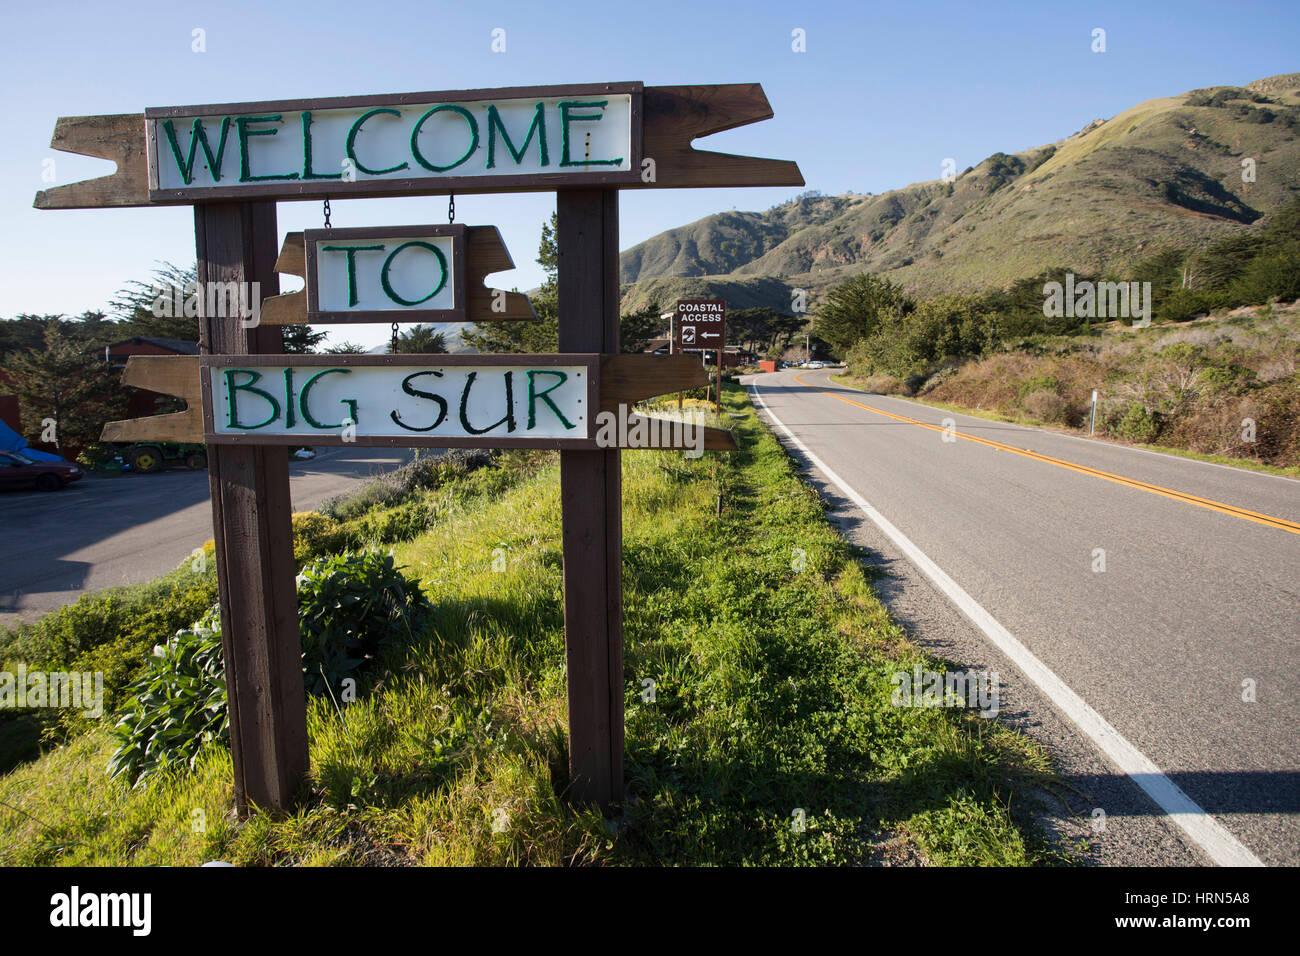 Big Sur, California, USA  2nd Mar, 2017  California Highway 1 is